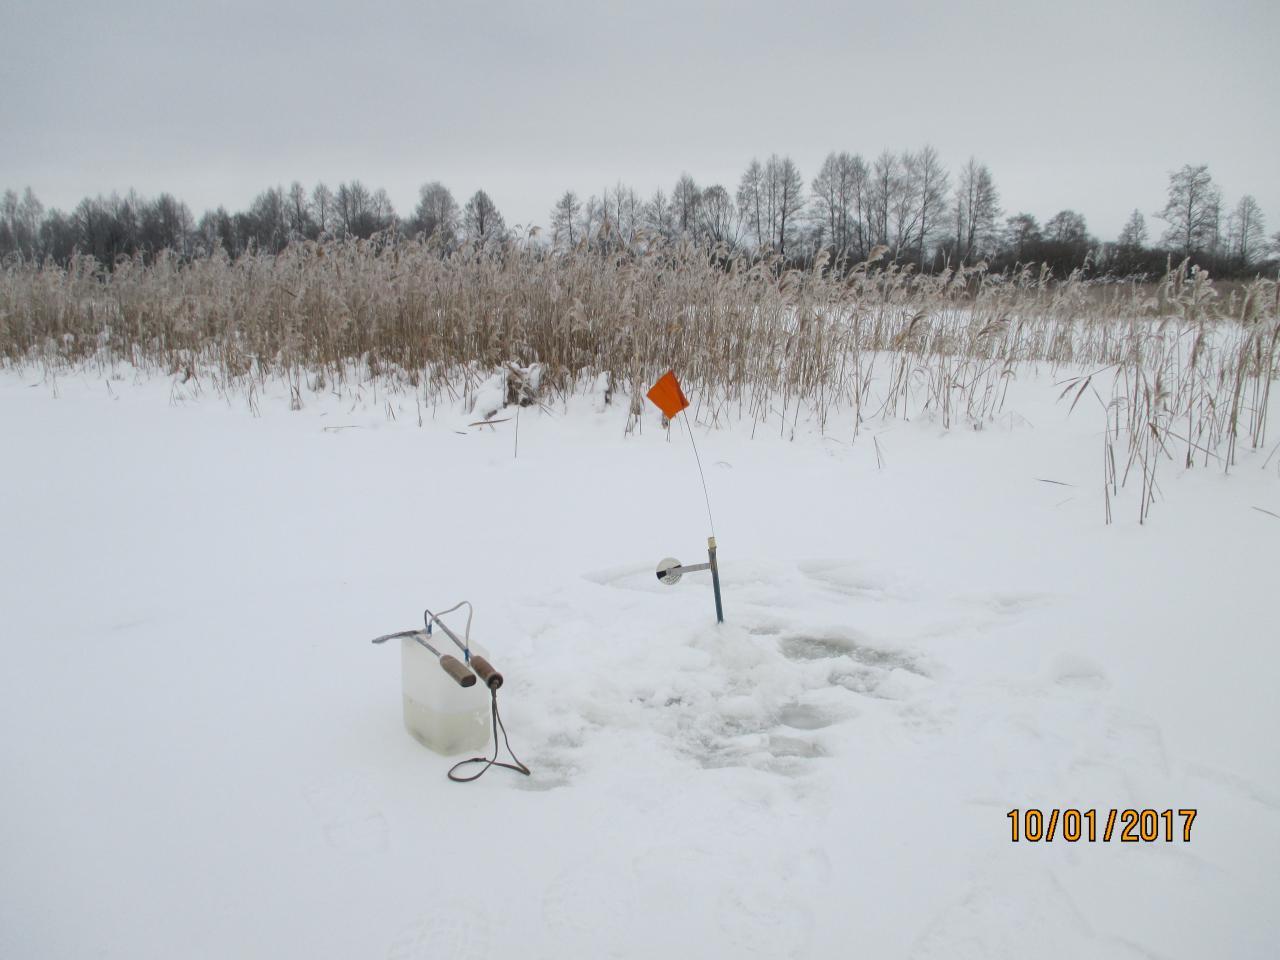 «А я такой, а я упрямый, я …» ... | Отчеты о рыбалке в Беларуси